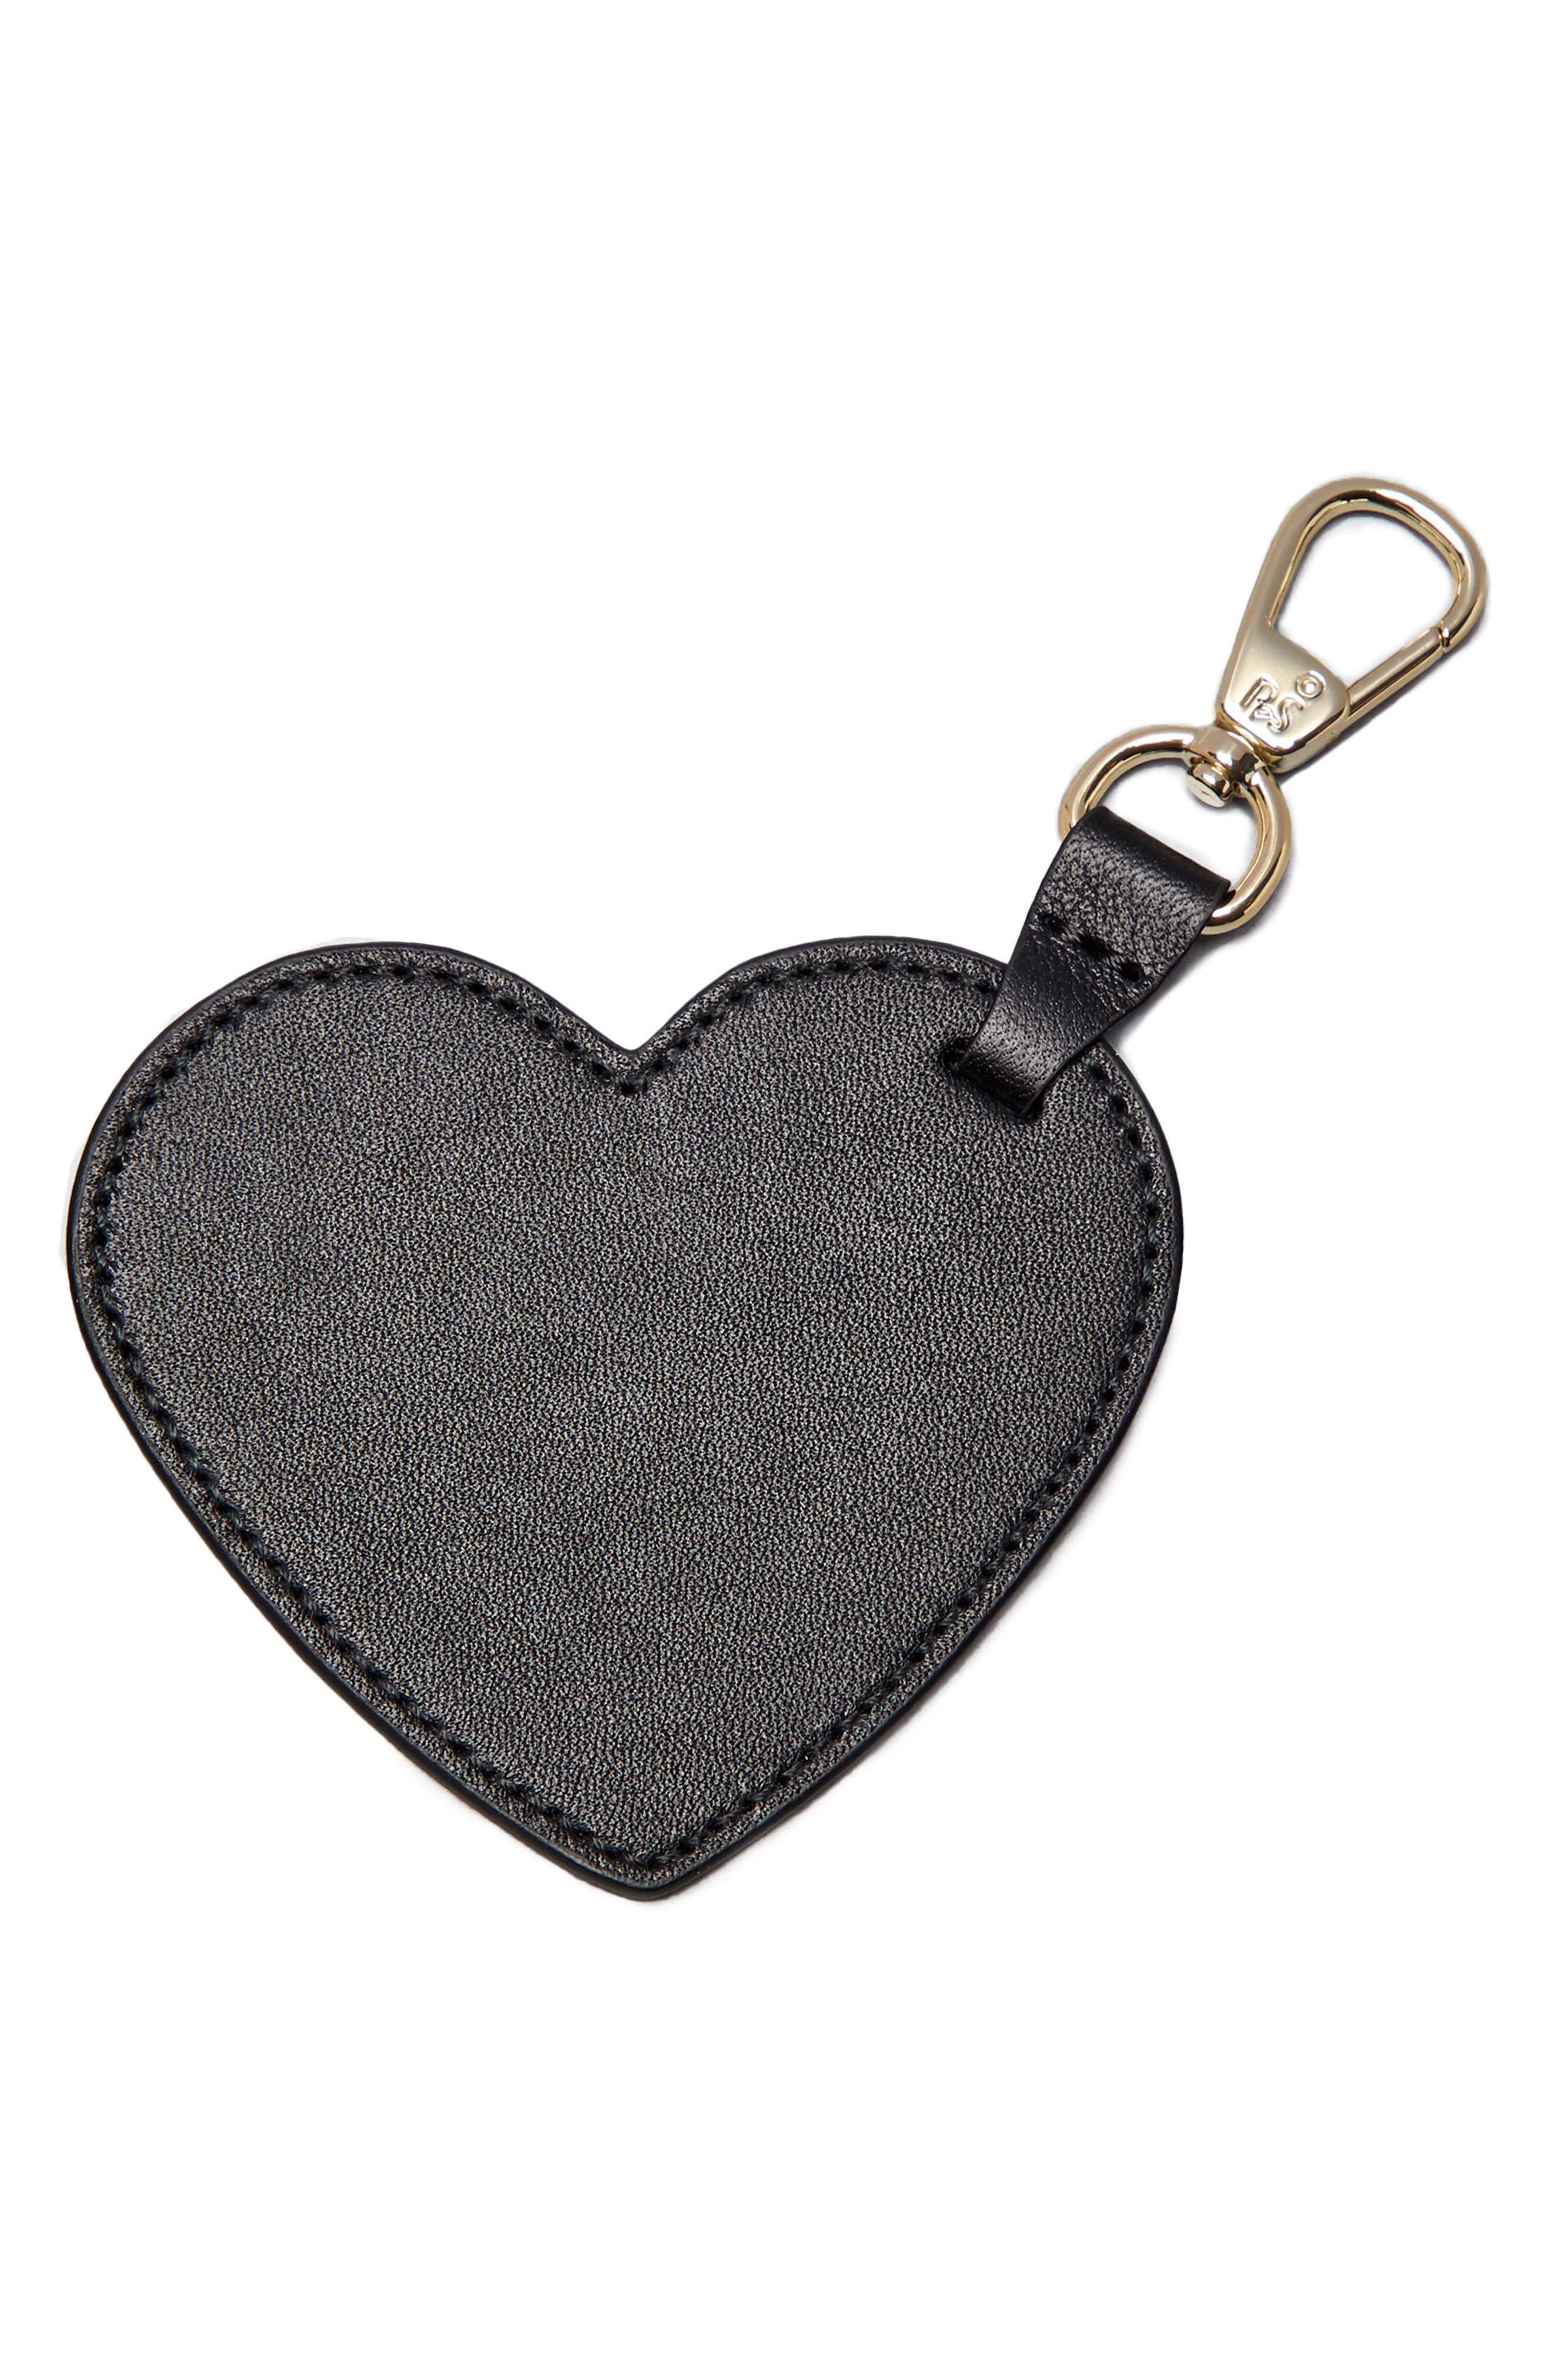 Smaller Heart Bag Charm,                             Main thumbnail 1, color,                             001